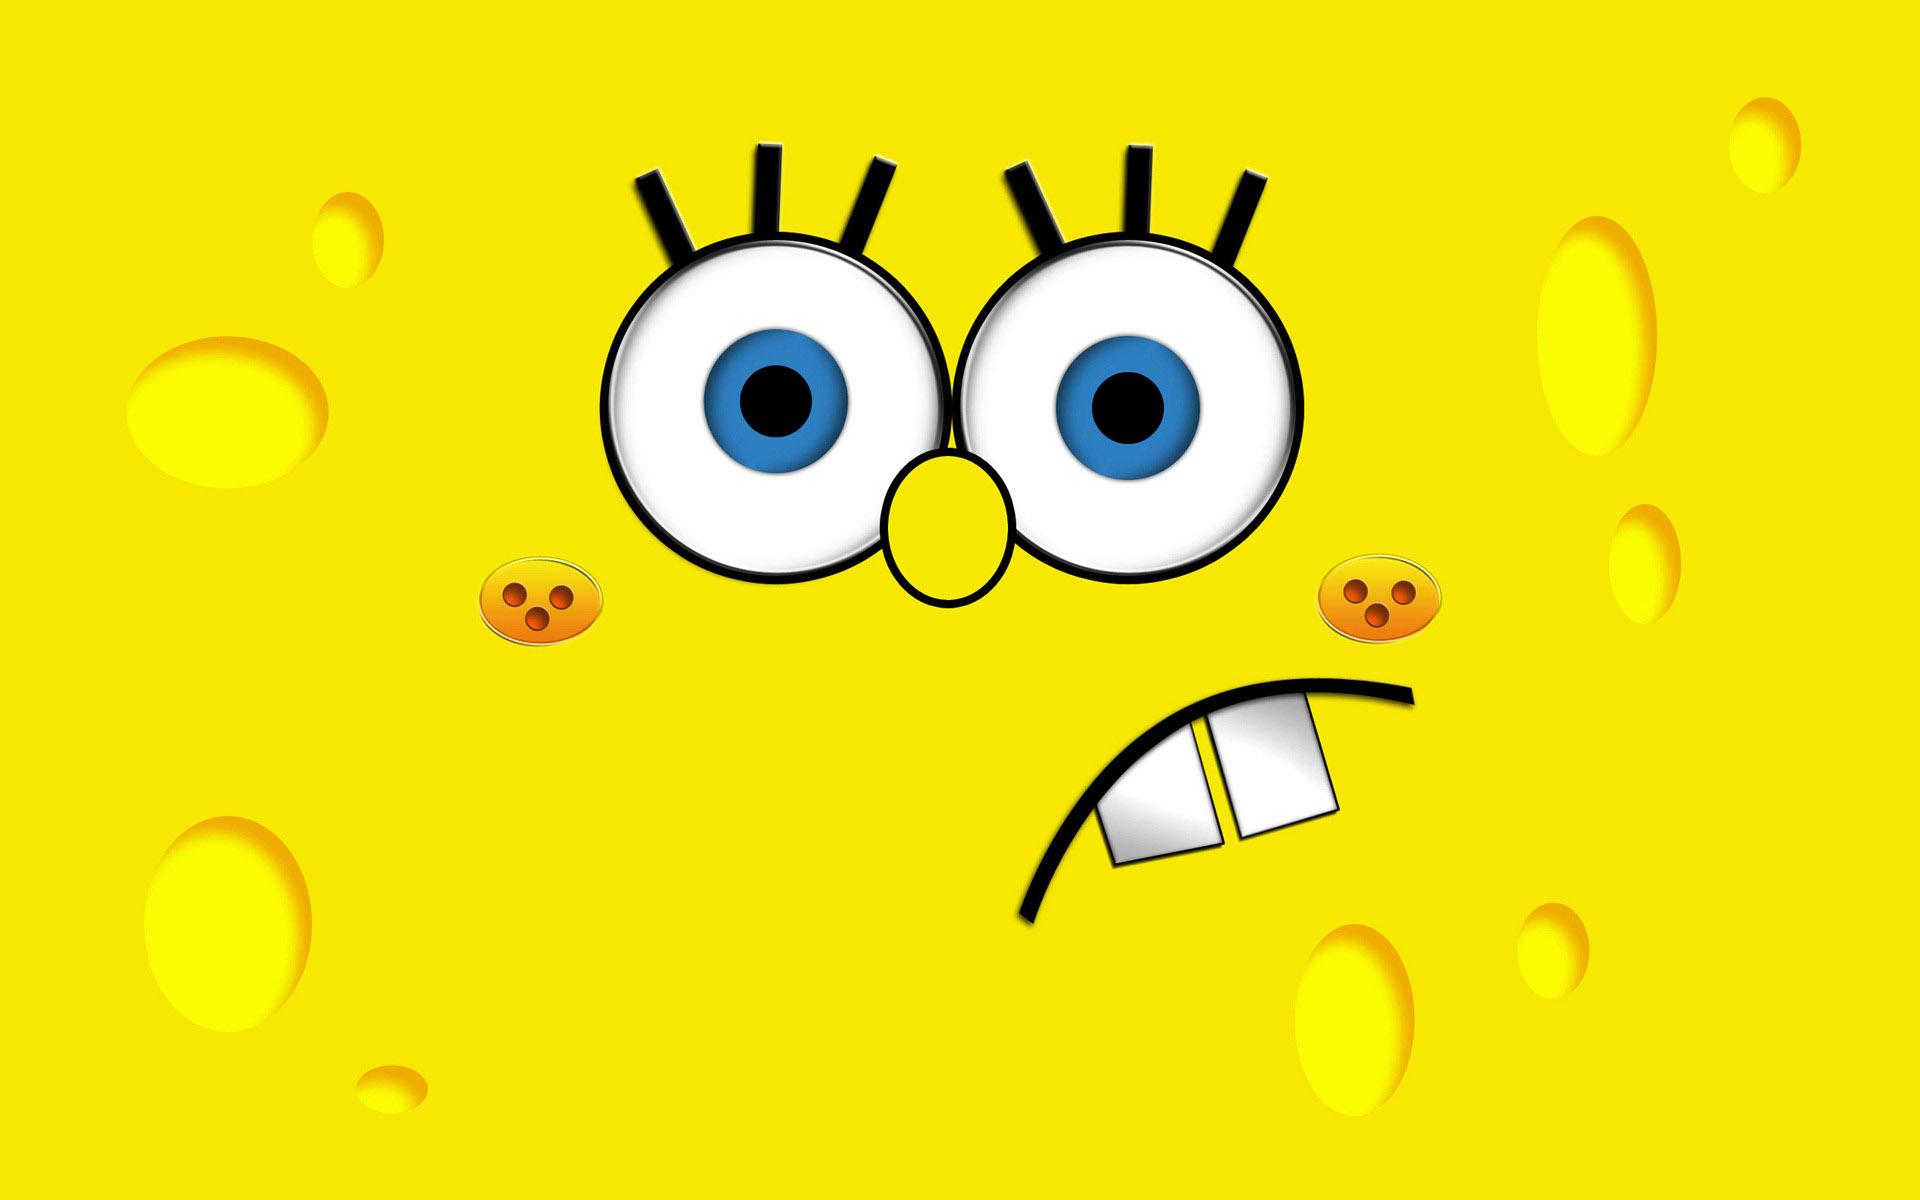 SpongeBob SquarePants wallpapers HD curious left